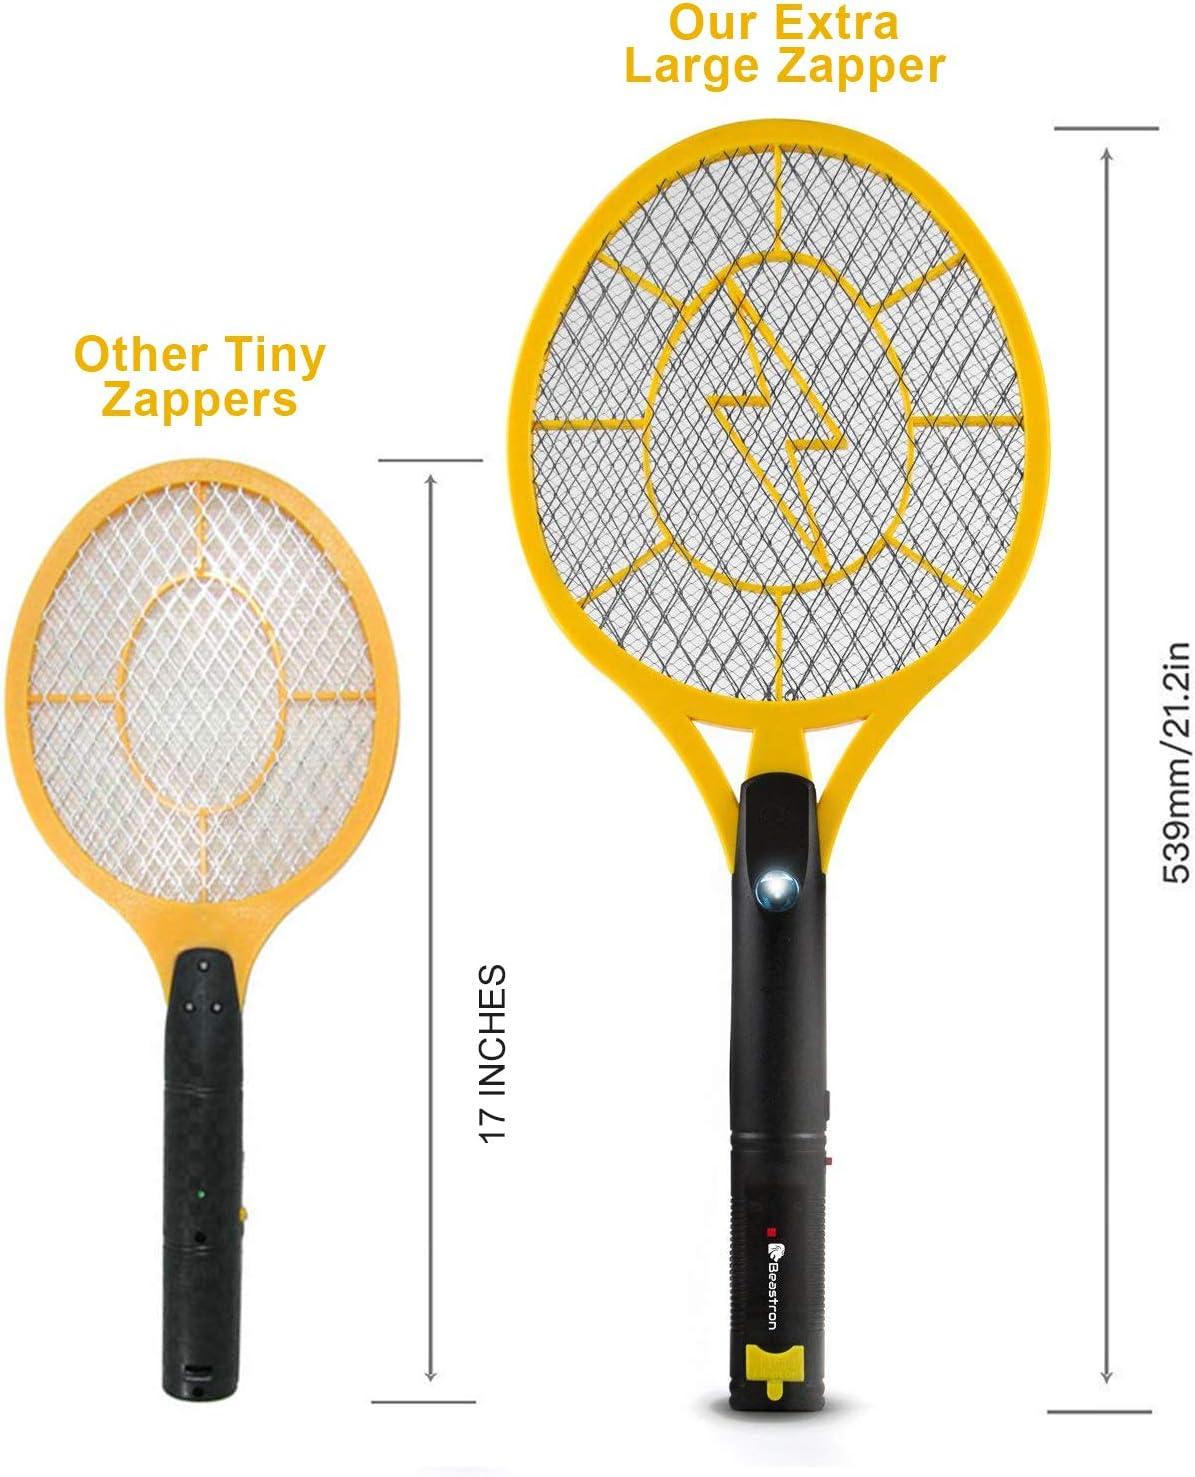 Gjyia USB Charge Elektrische Fliegenklatsche Teleskop Moskito Killer Insect Reject Racket BL